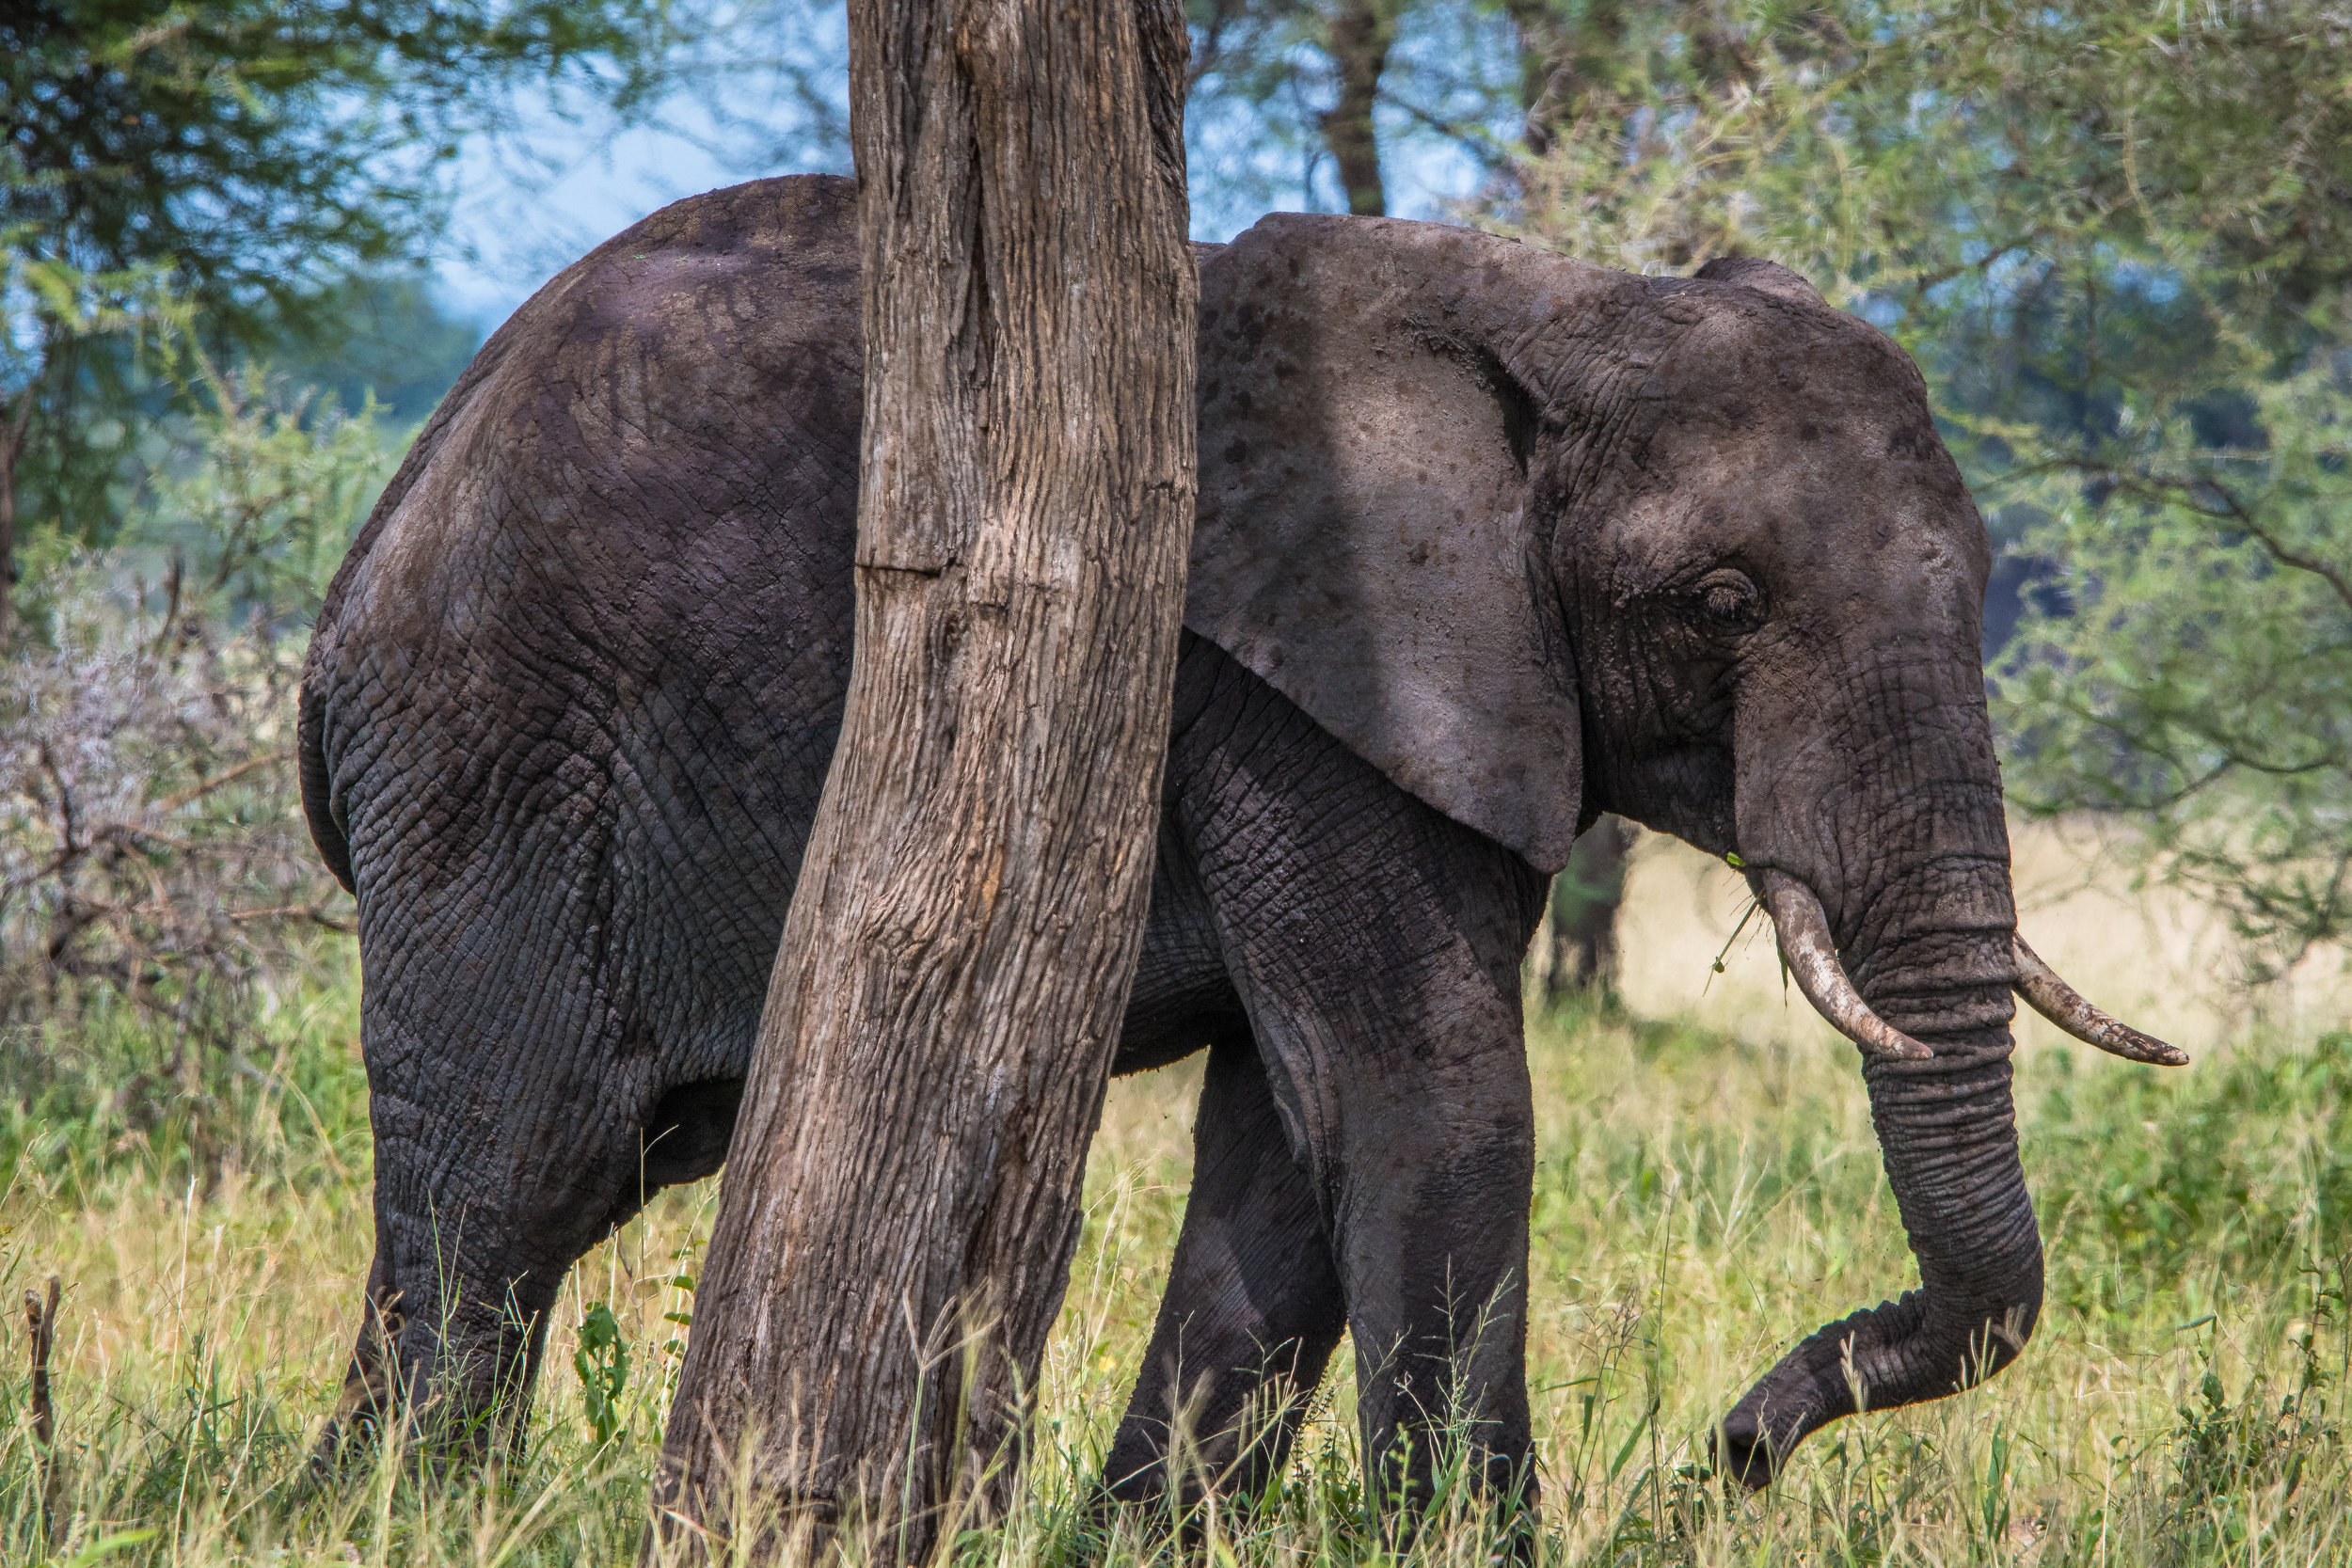 2018-3-6 - 02 Elephant.jpg